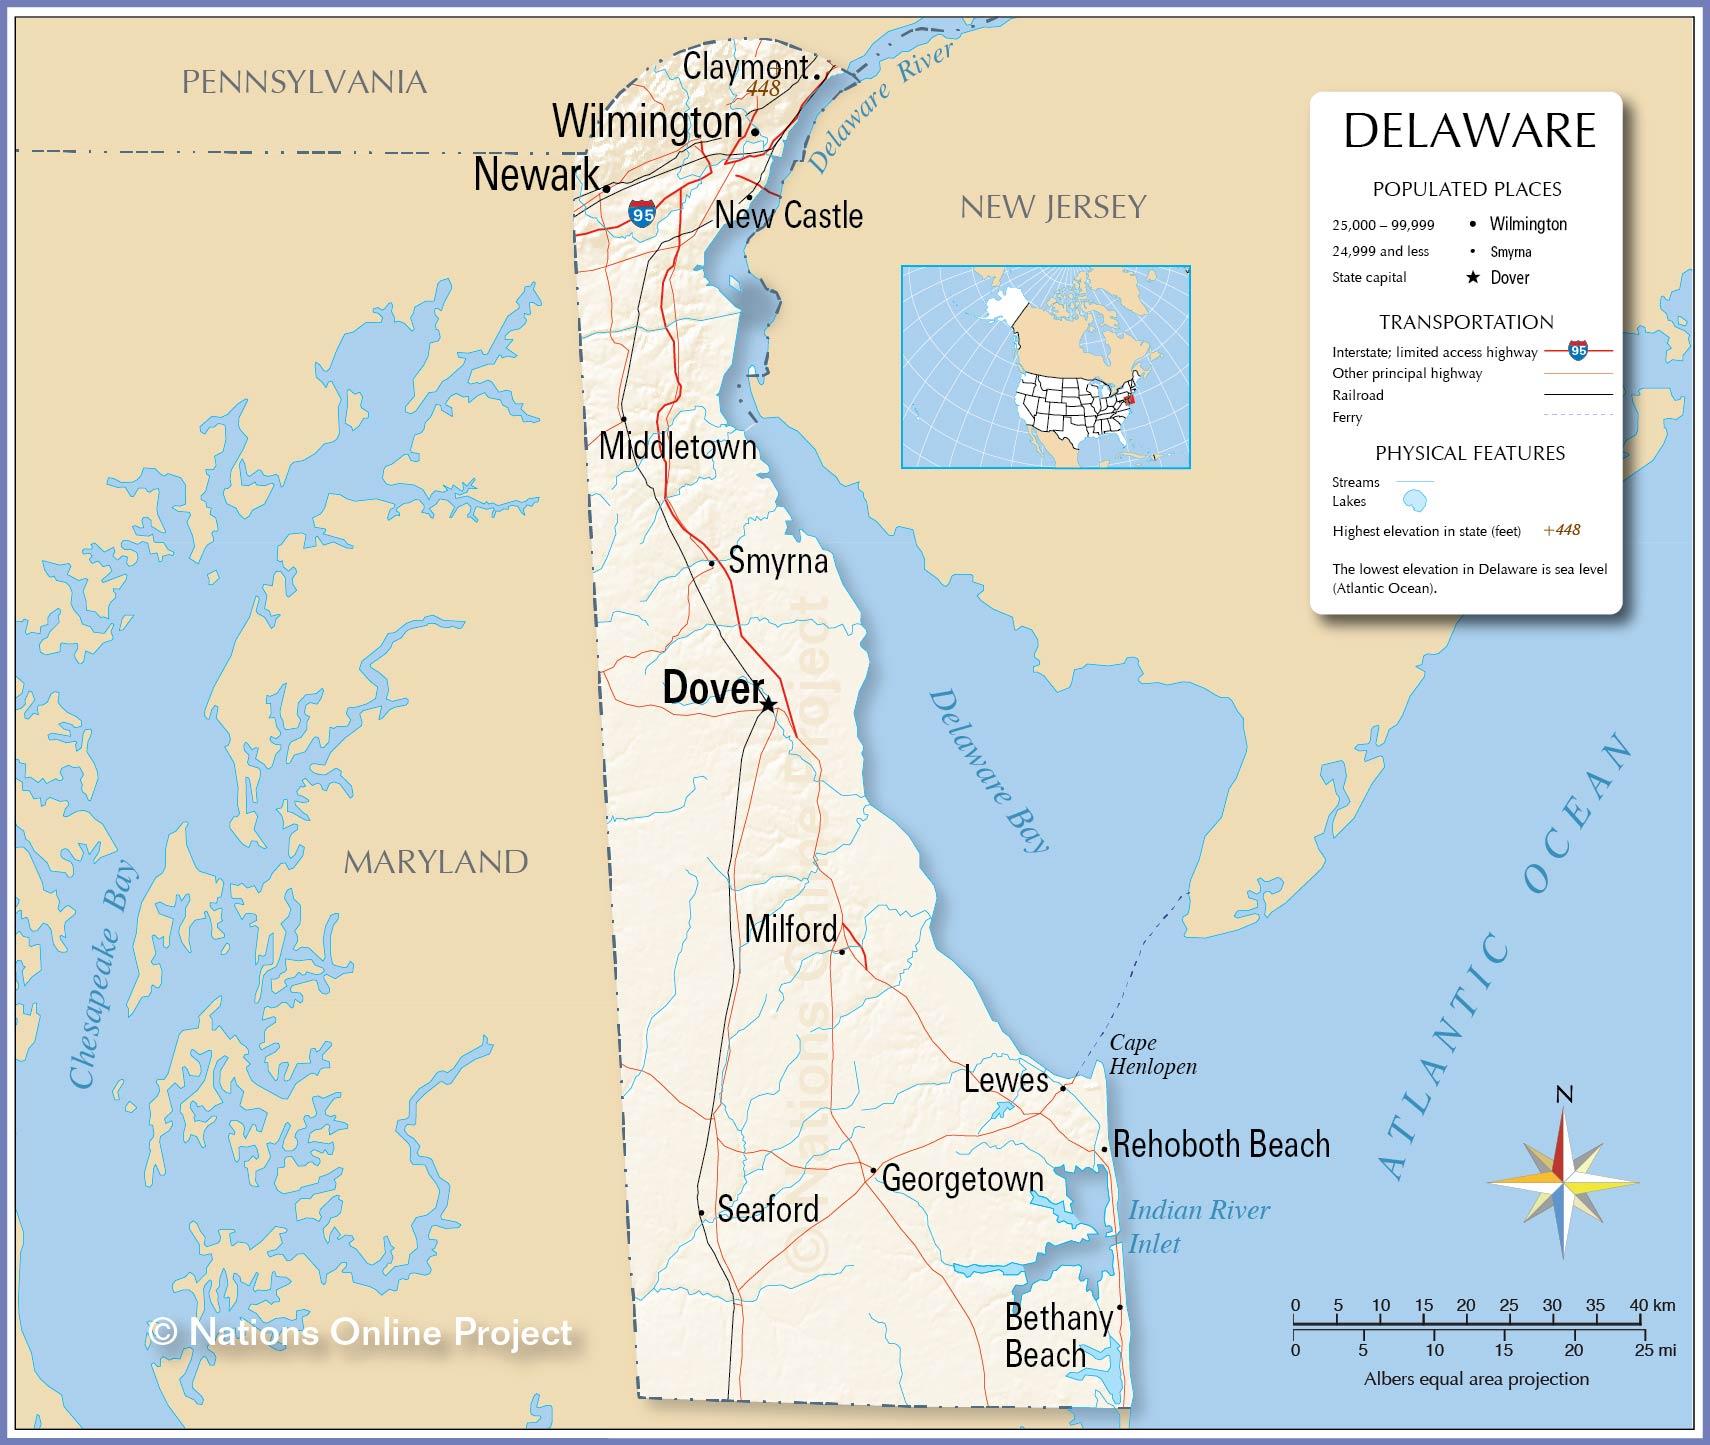 Delaware Detailed map